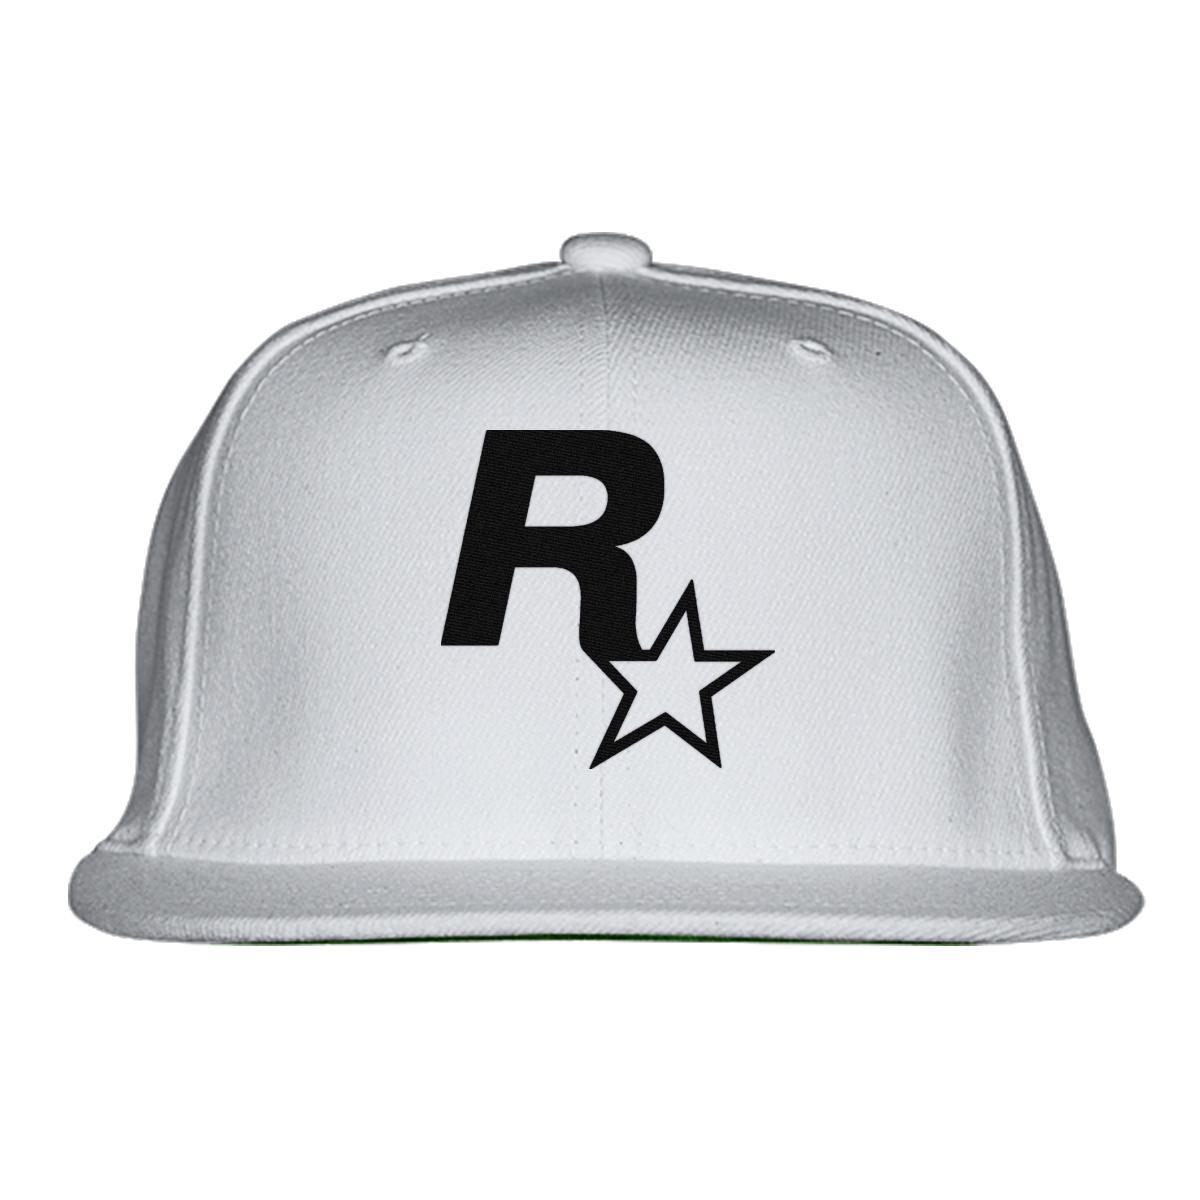 4522272c3f45b7 ... reduced rockstar games snapback hat embroidered customon e1499 84a0b